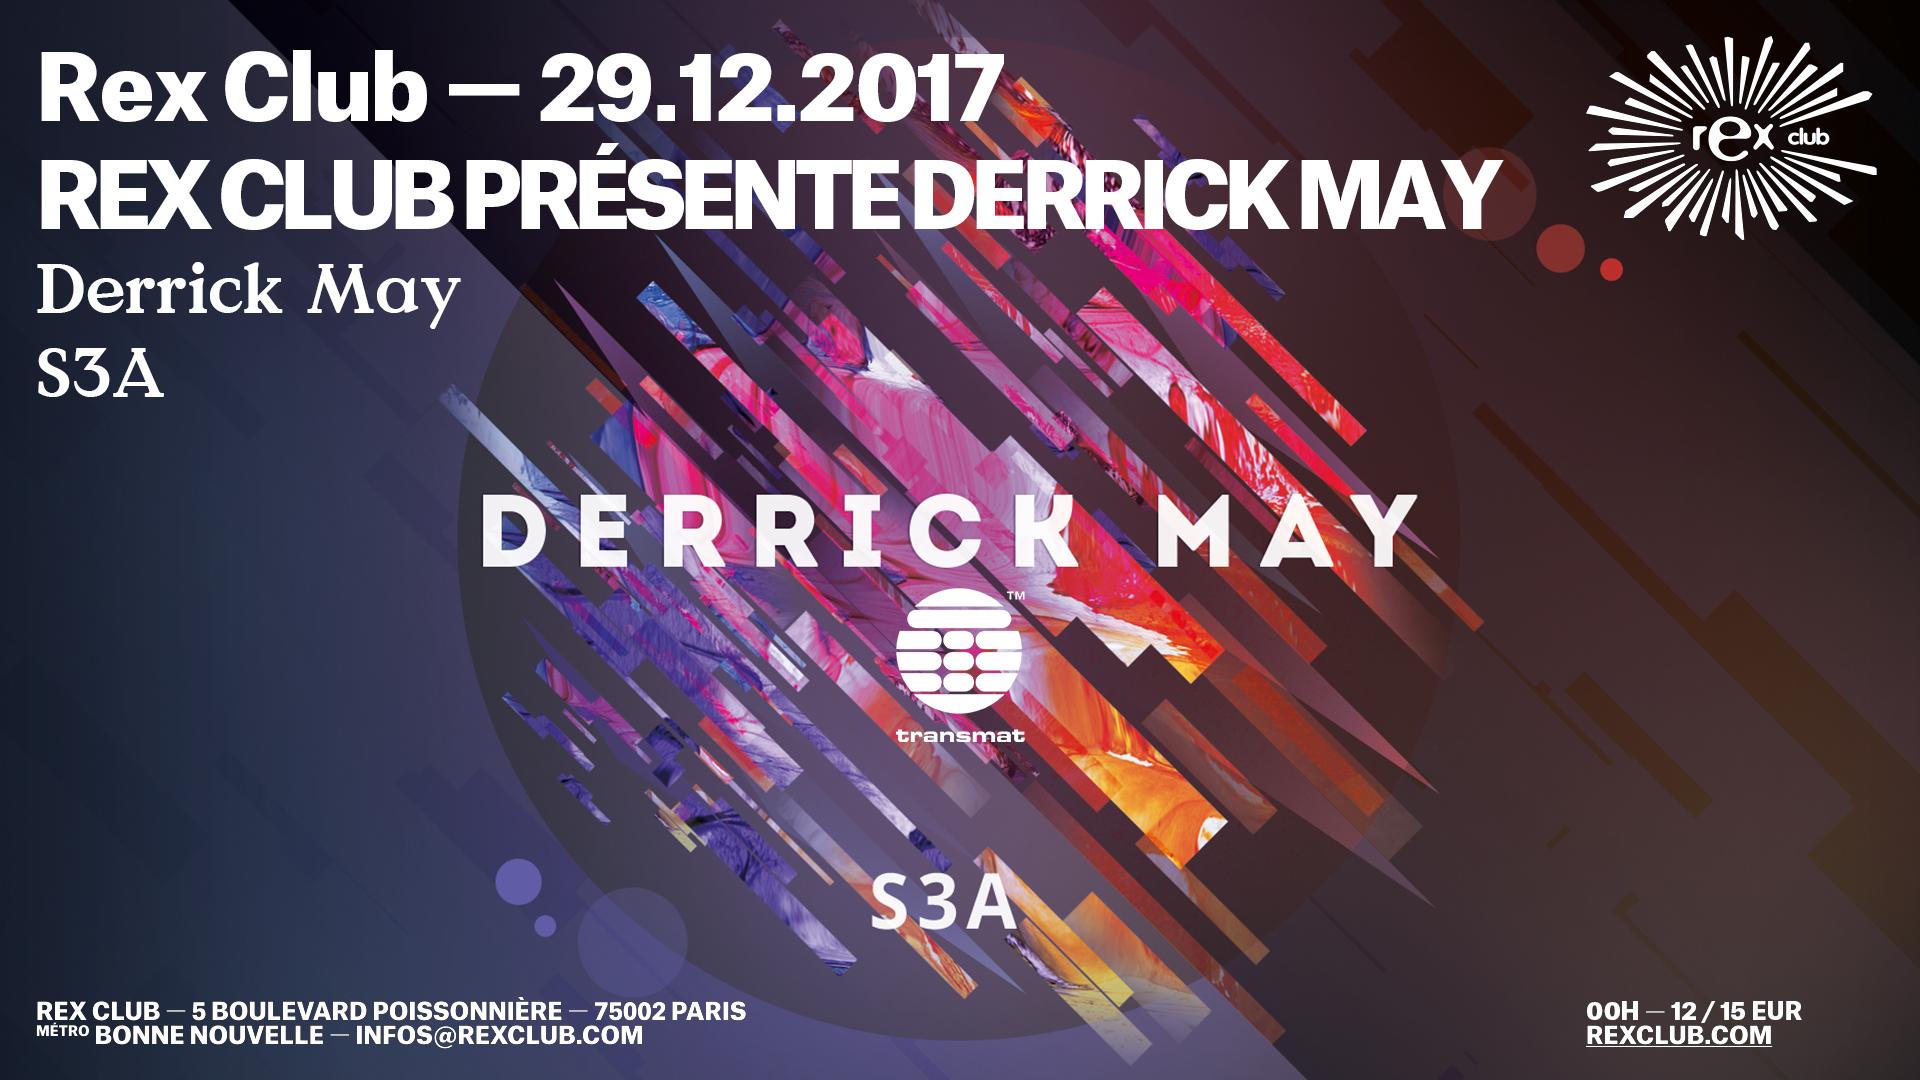 20171229_rex_club_presente_derrick_may_facebook_event_banner_1920x1080